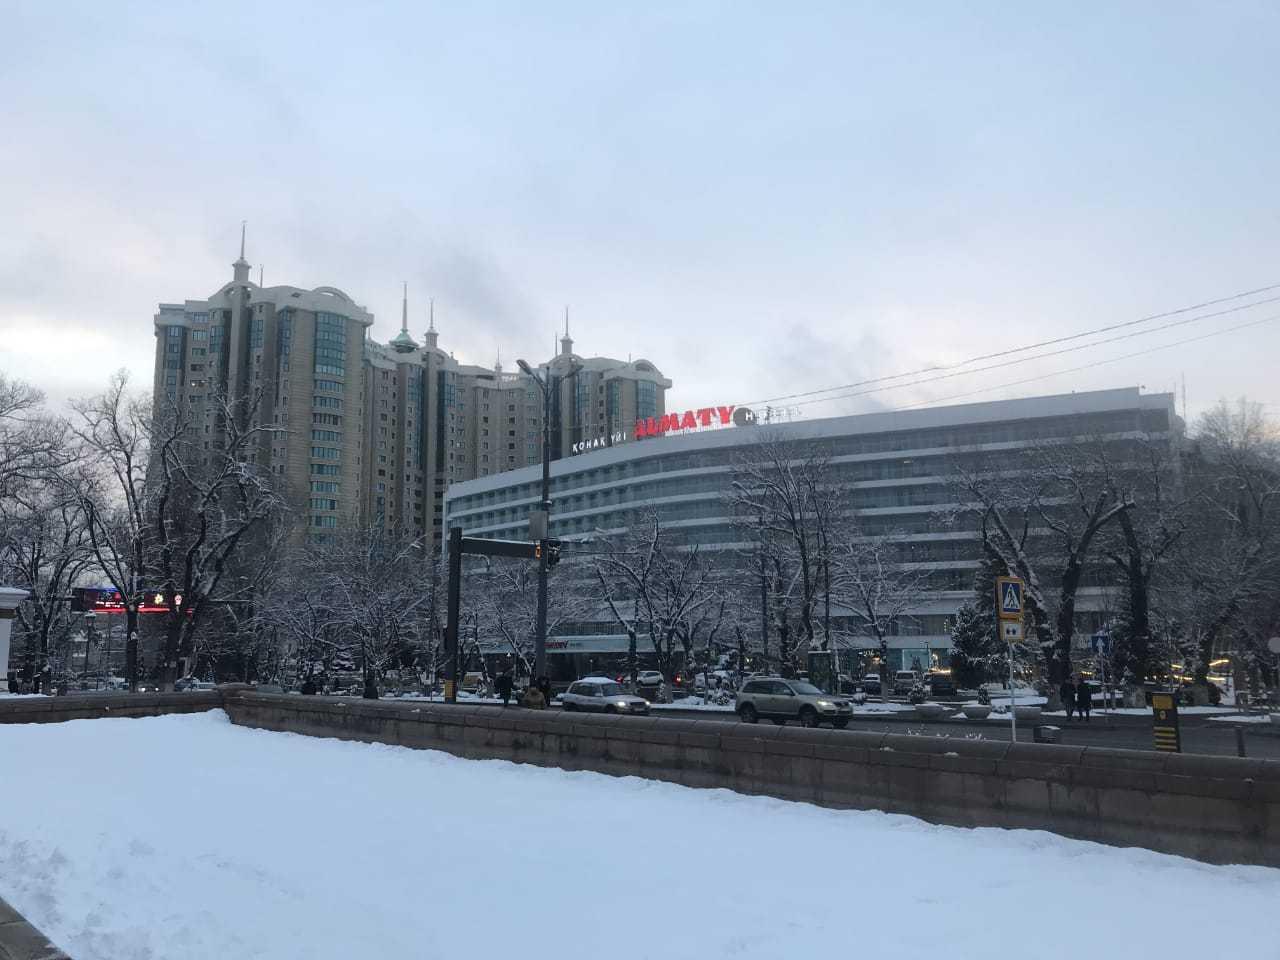 Hotel almaty Kazakhstan Architecture